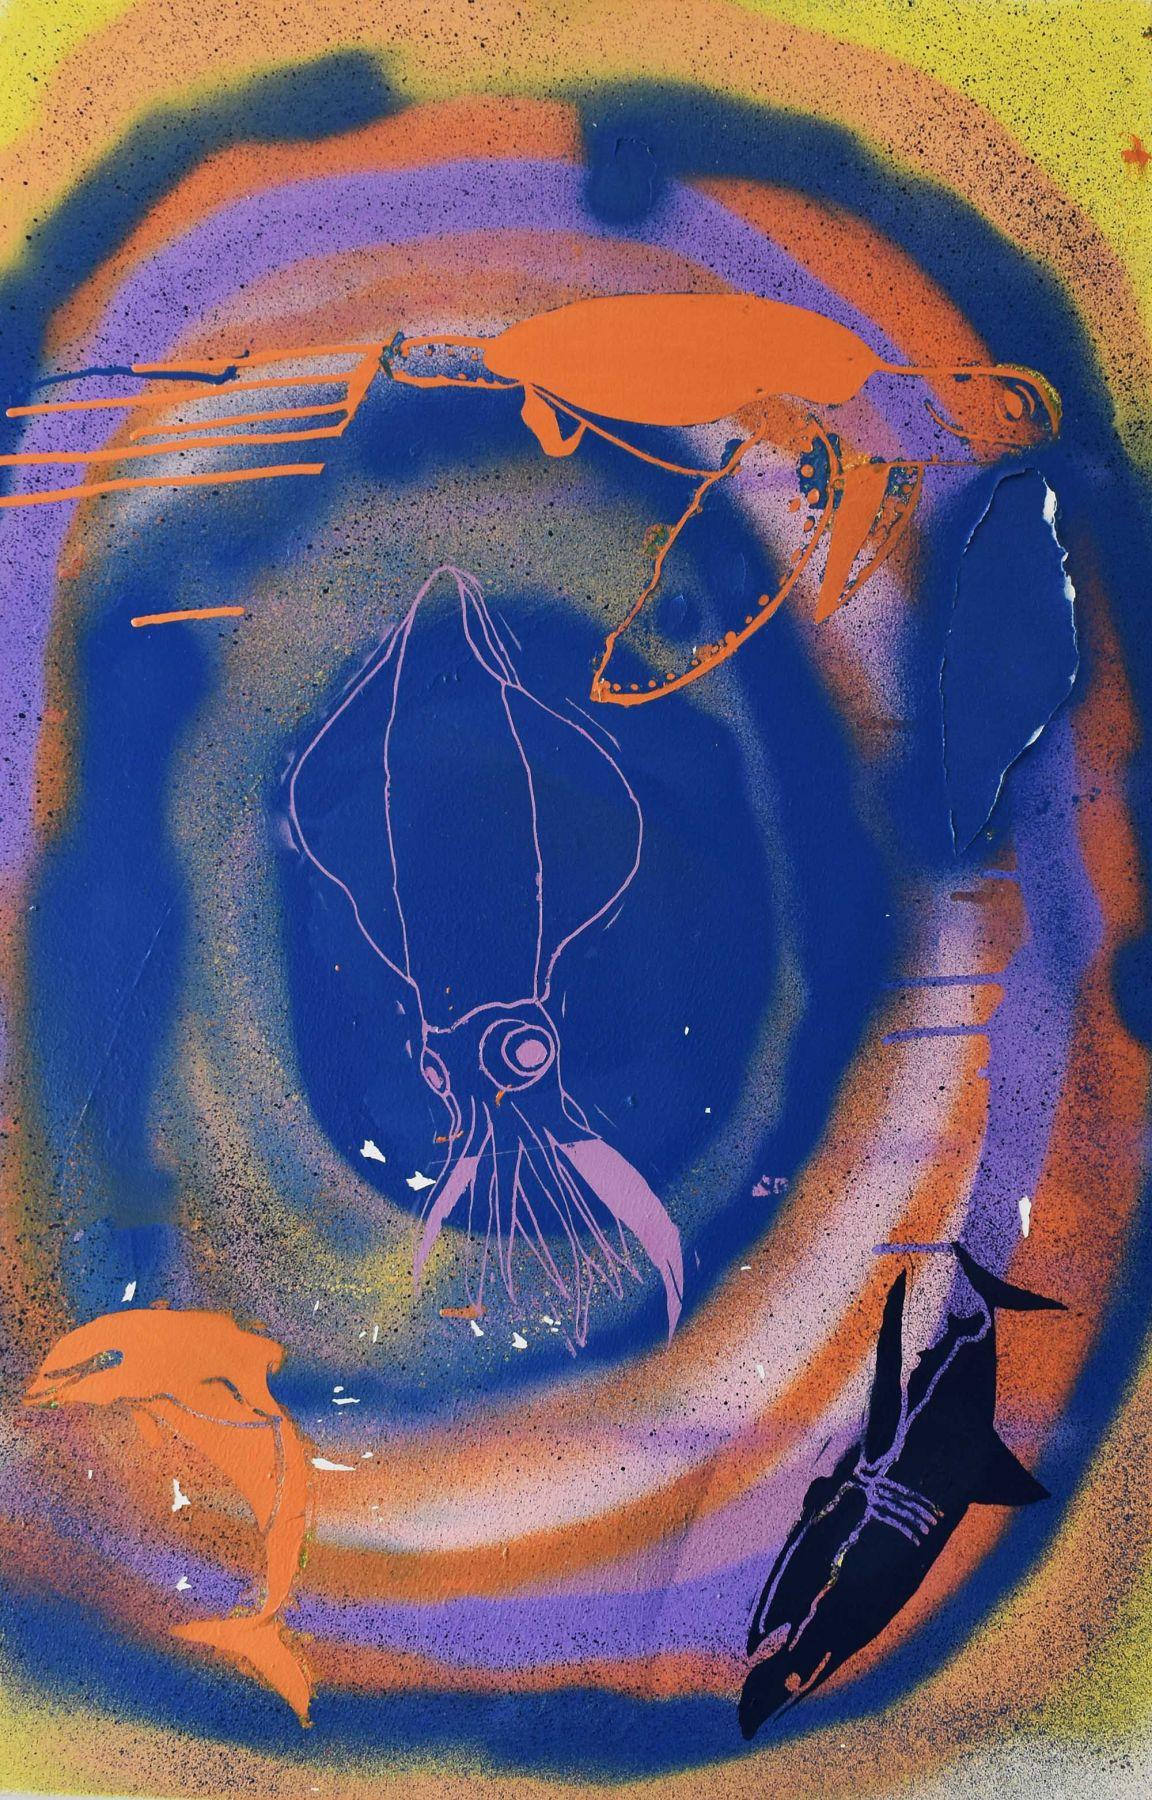 Jaimee Scott  Under the Sea, 2019 Artwork